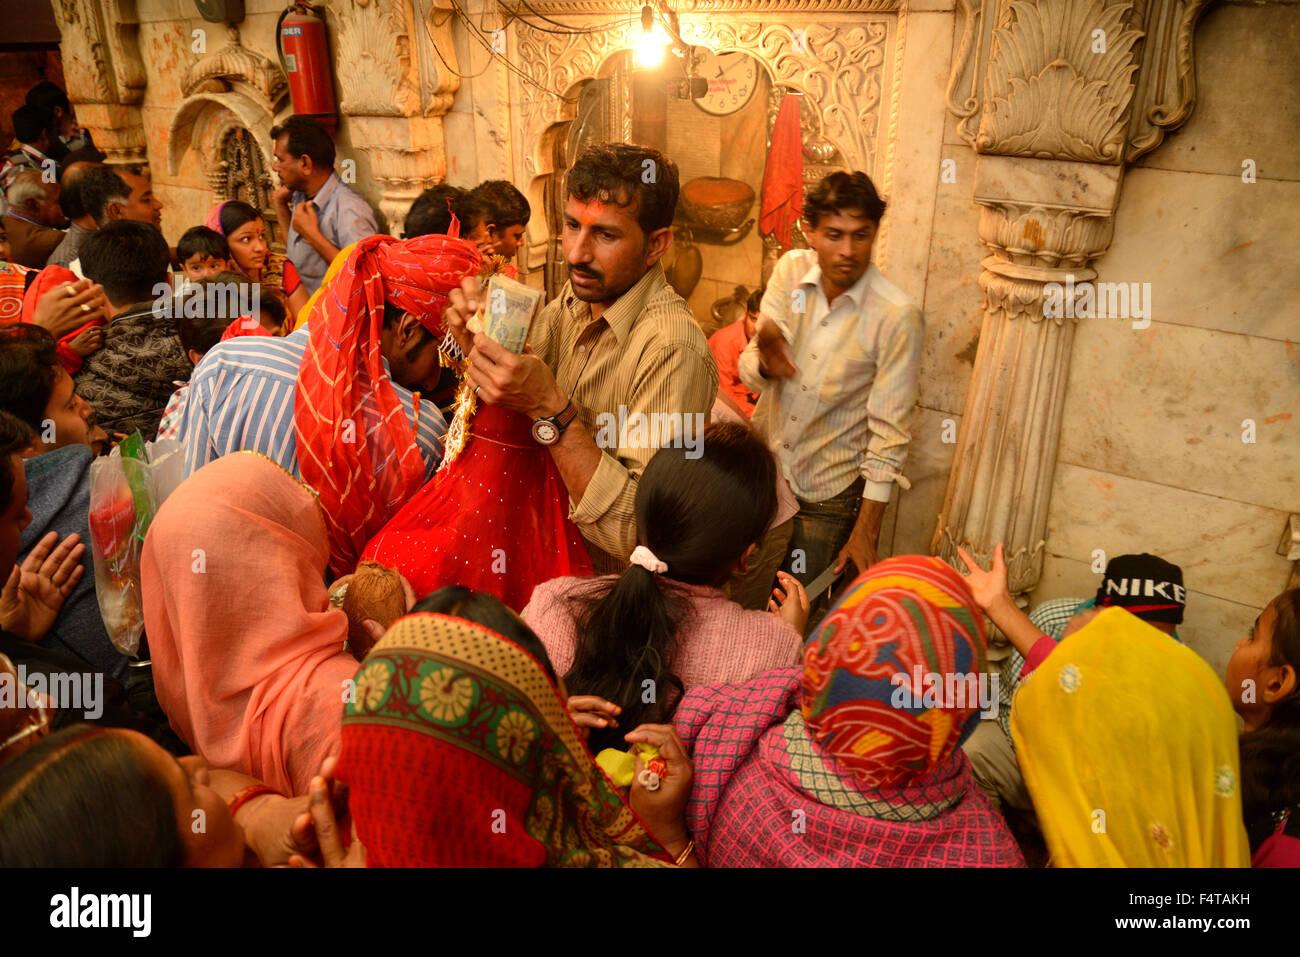 People waiting in line for rat temple, Karni Mata, town of Deschnoke, Rajasthan, India, Asia - Stock Image